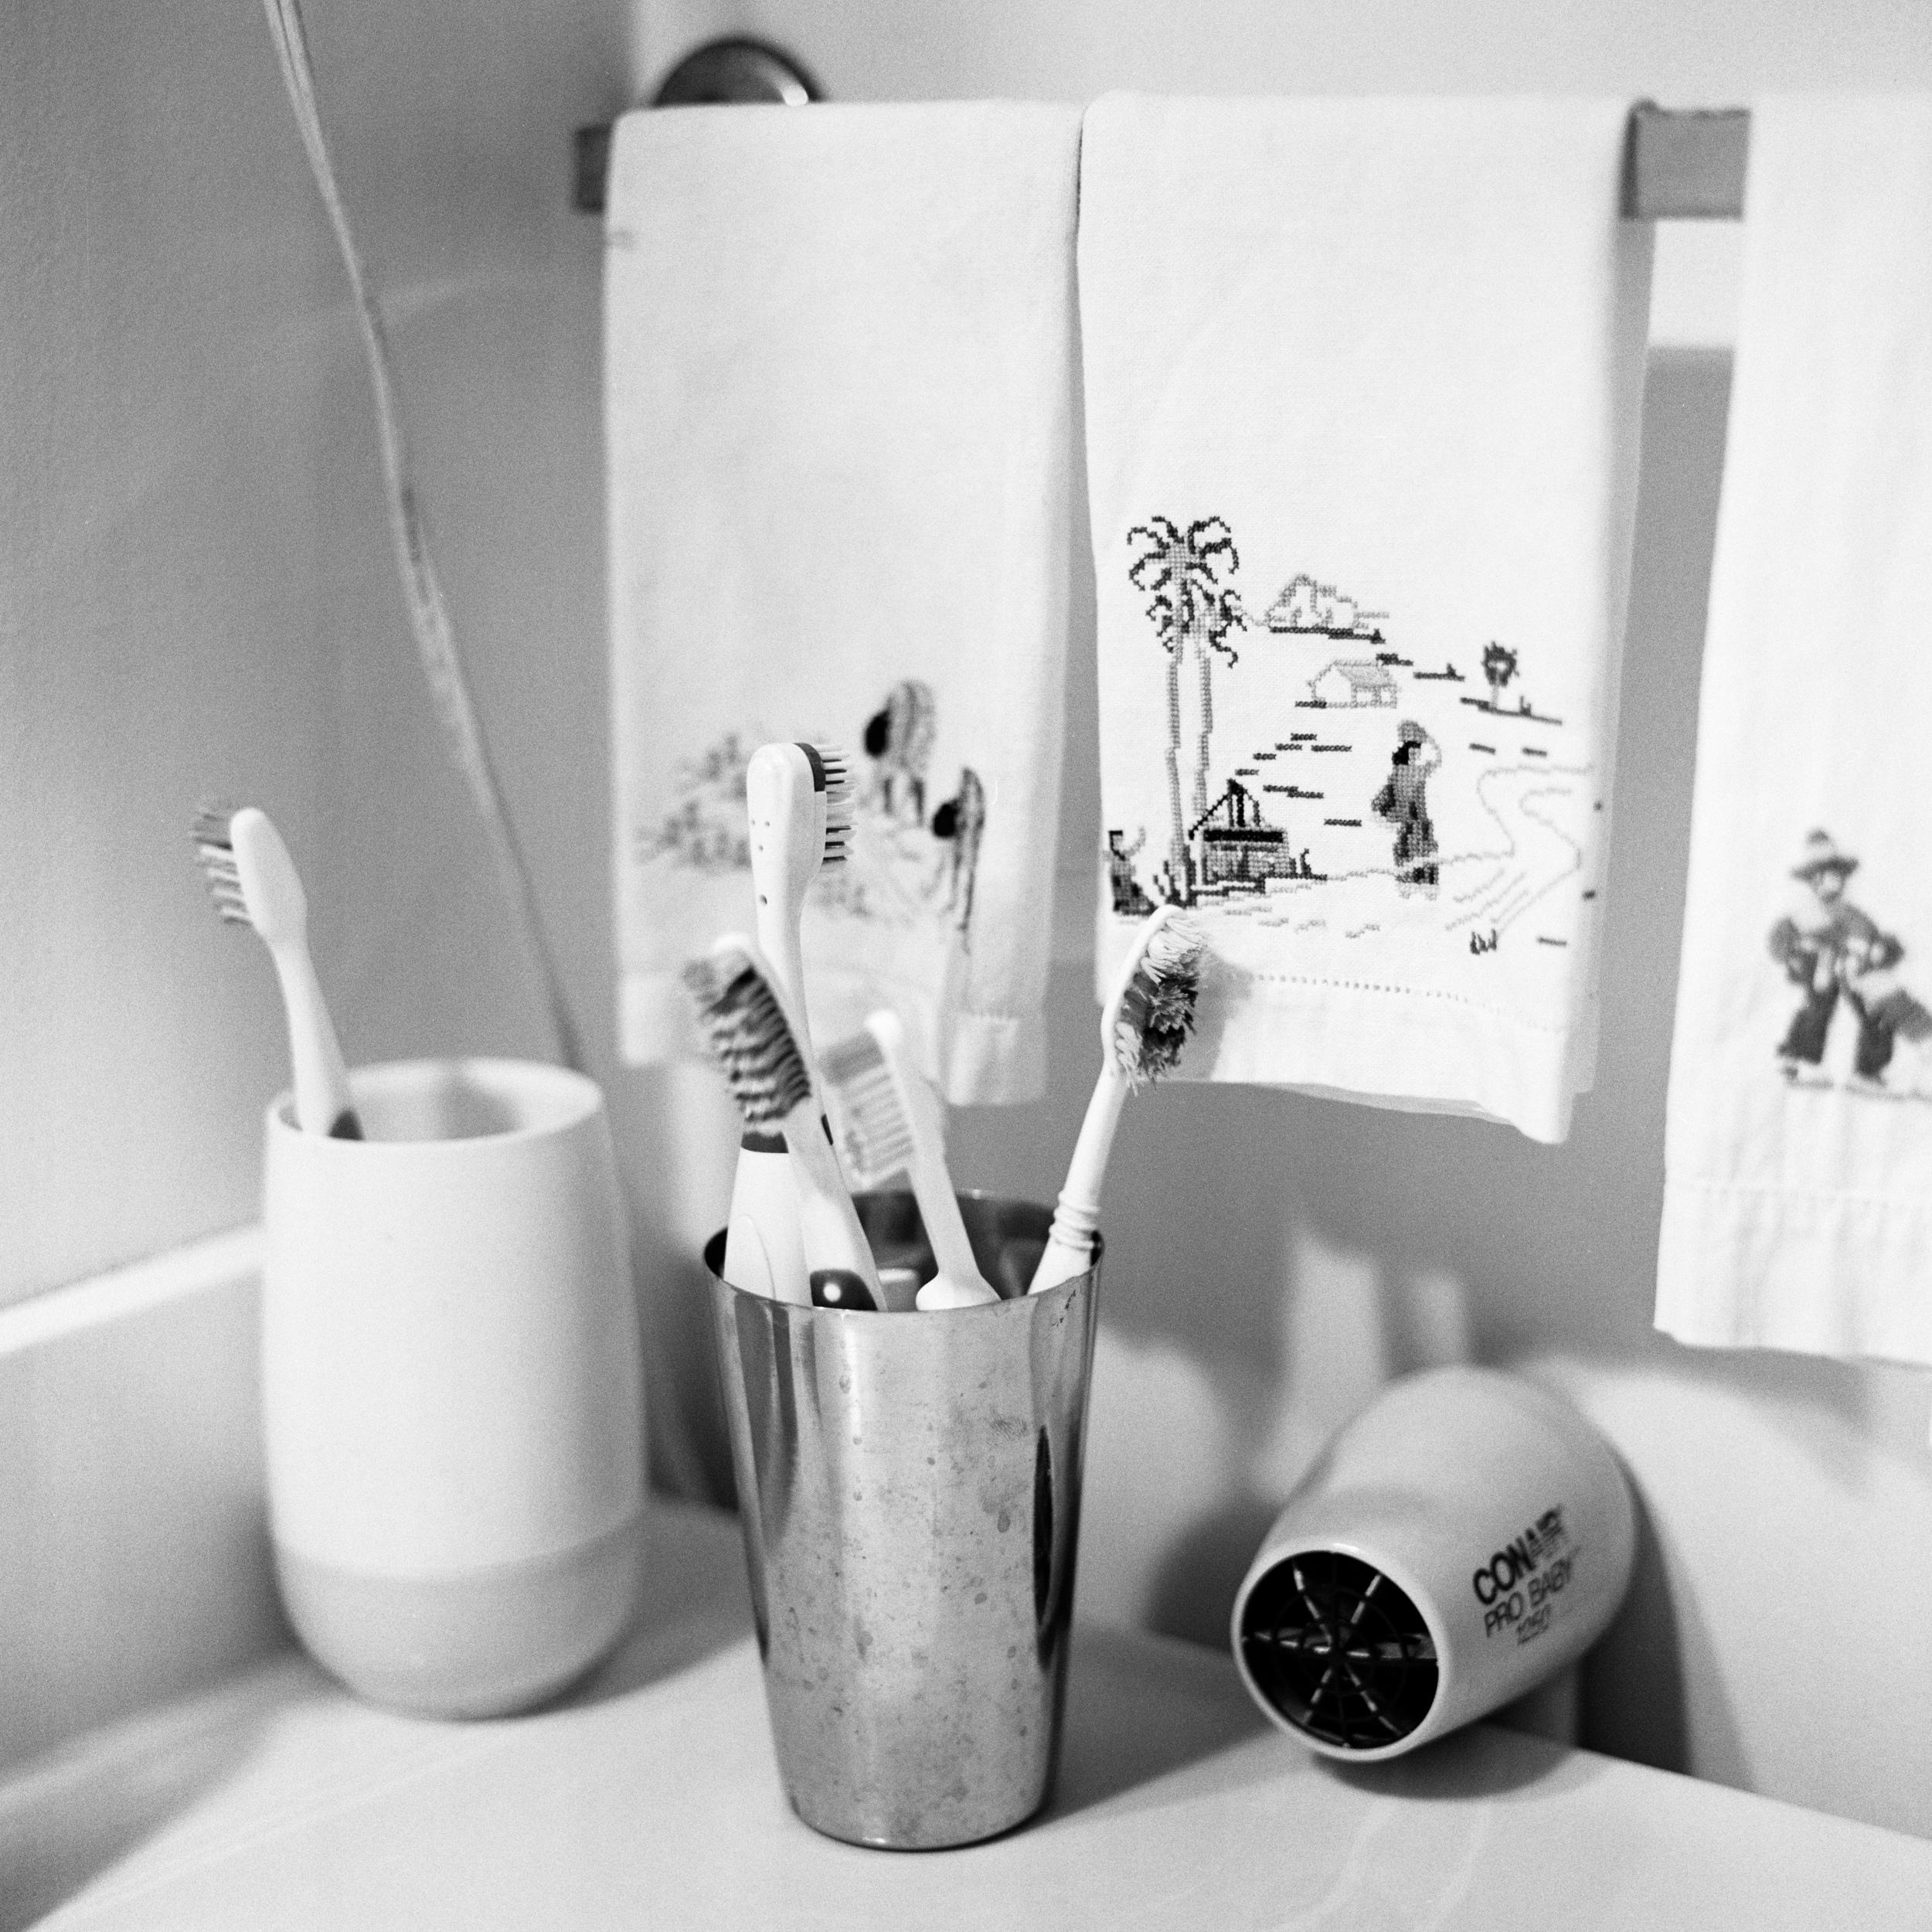 tooth brushes-Edit-Edit.jpg